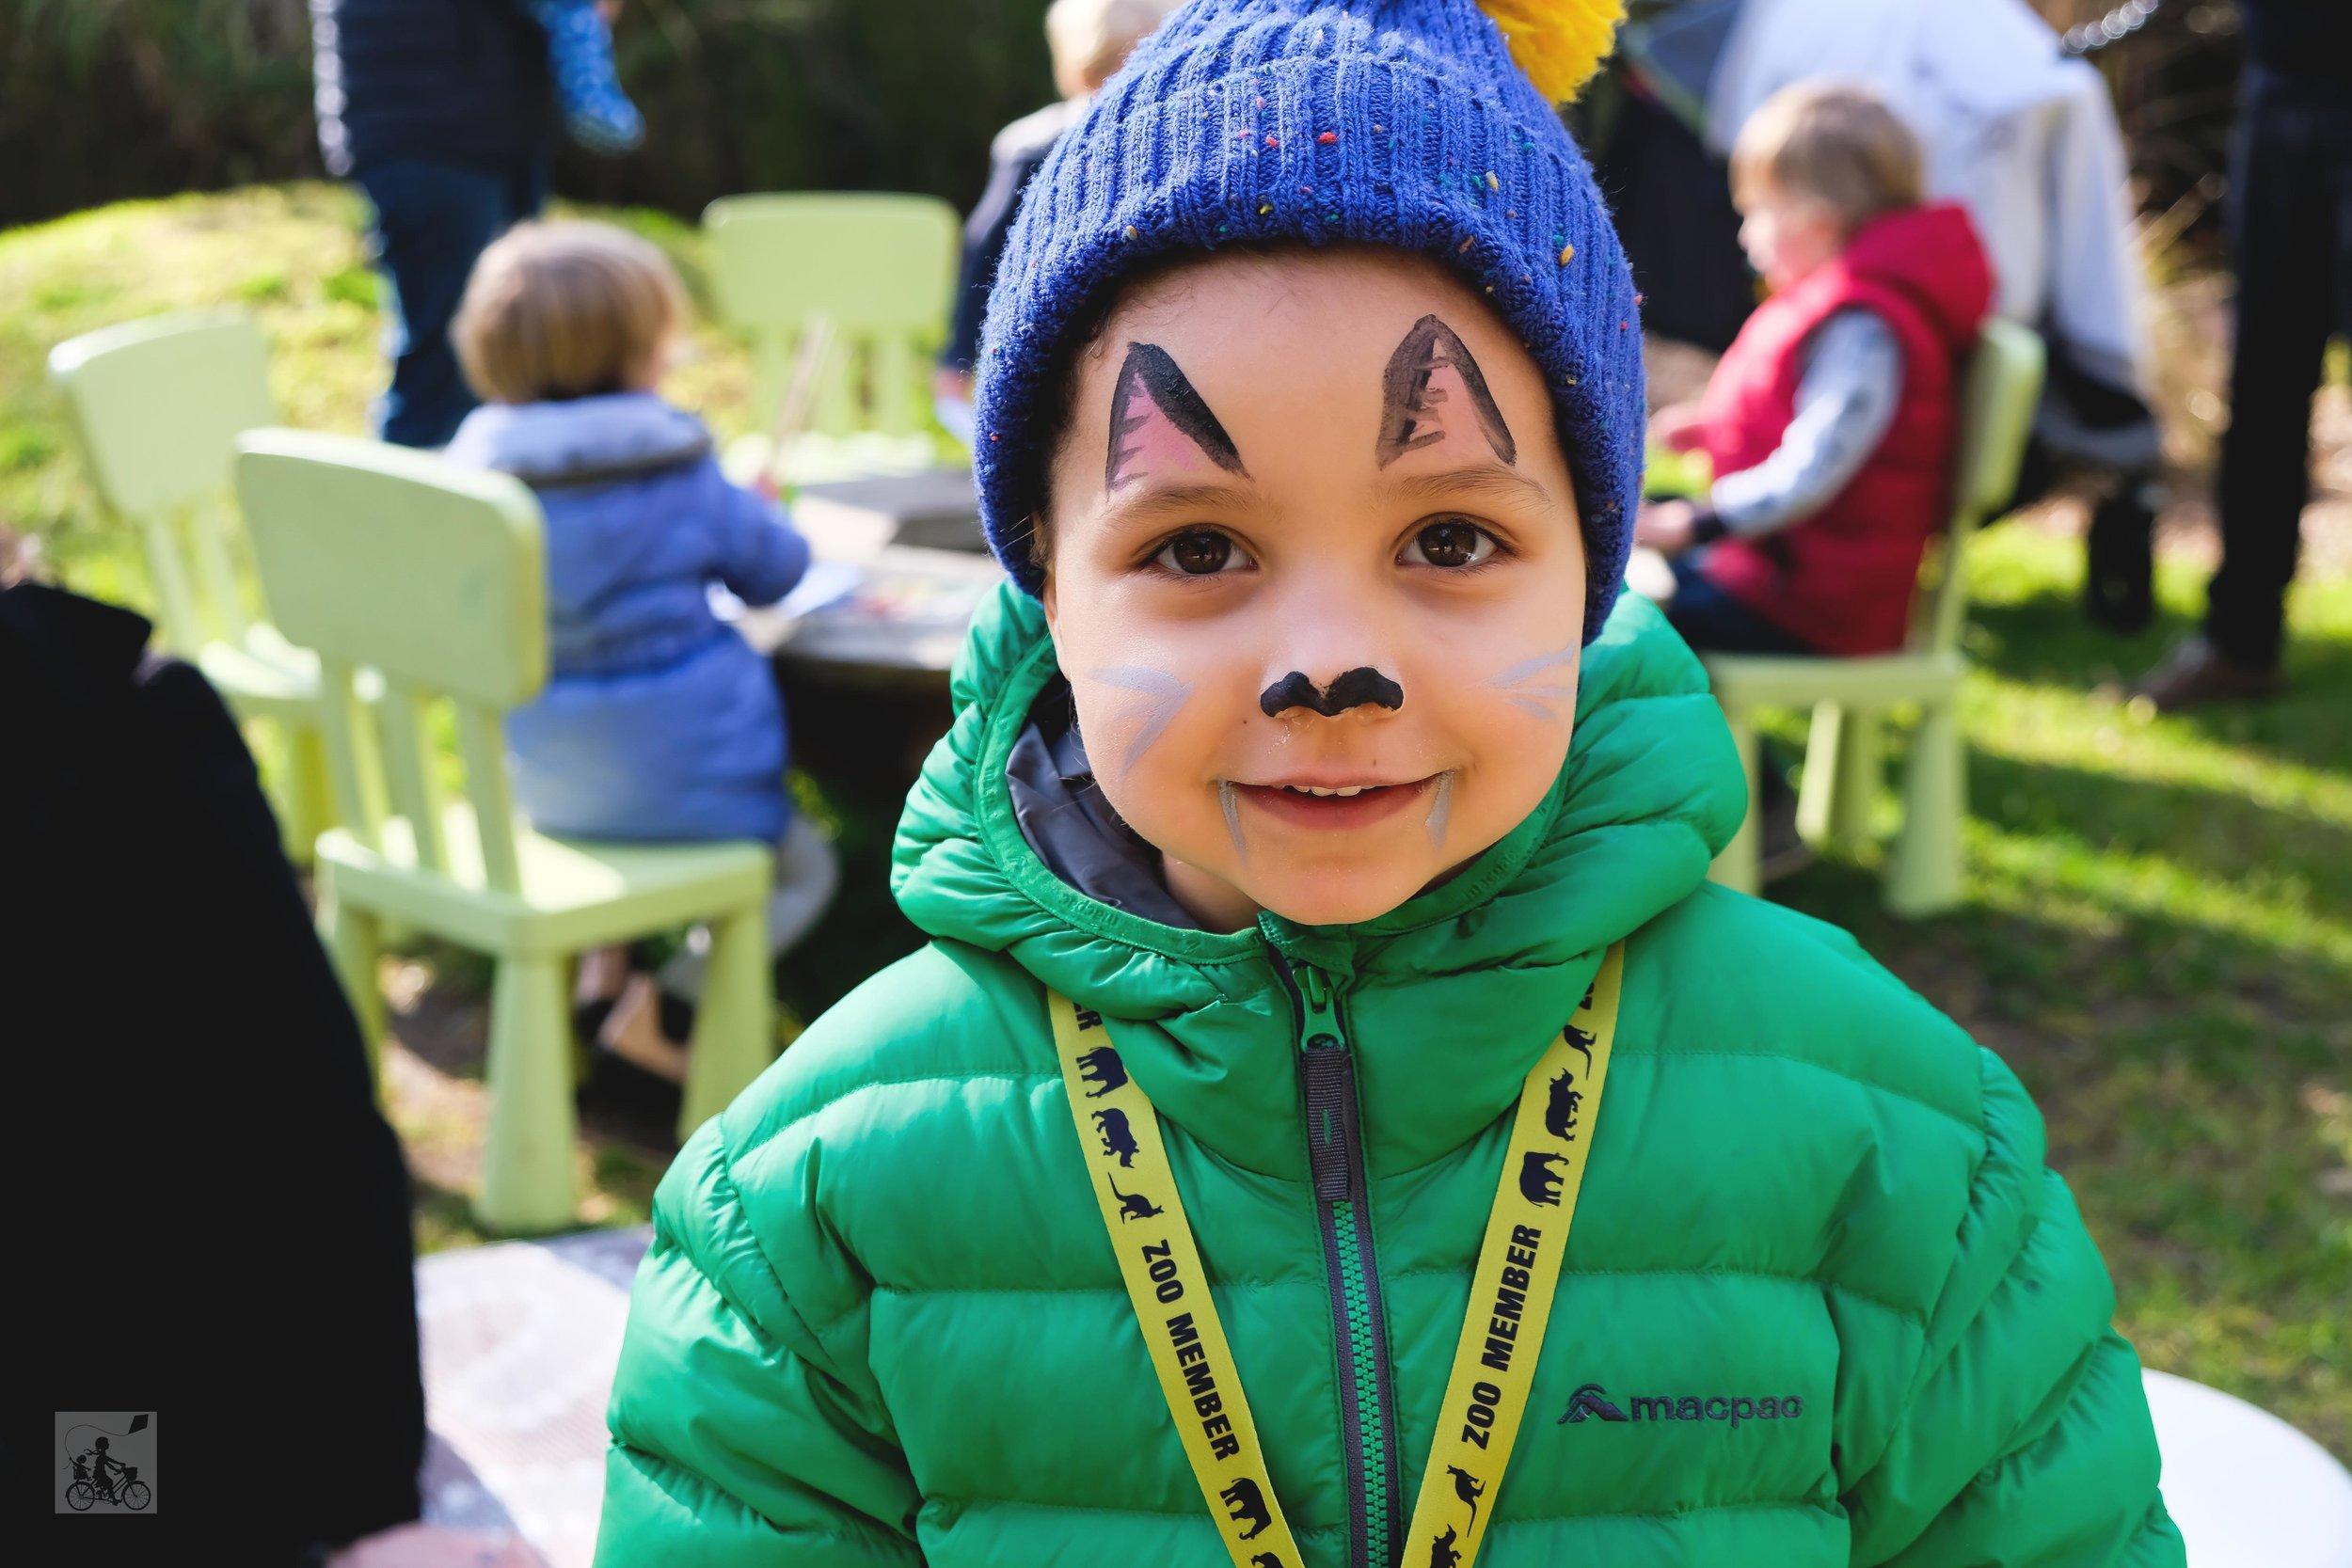 tasmanian devil tuesdays at melbourne zoo, parkville - mamma knows north